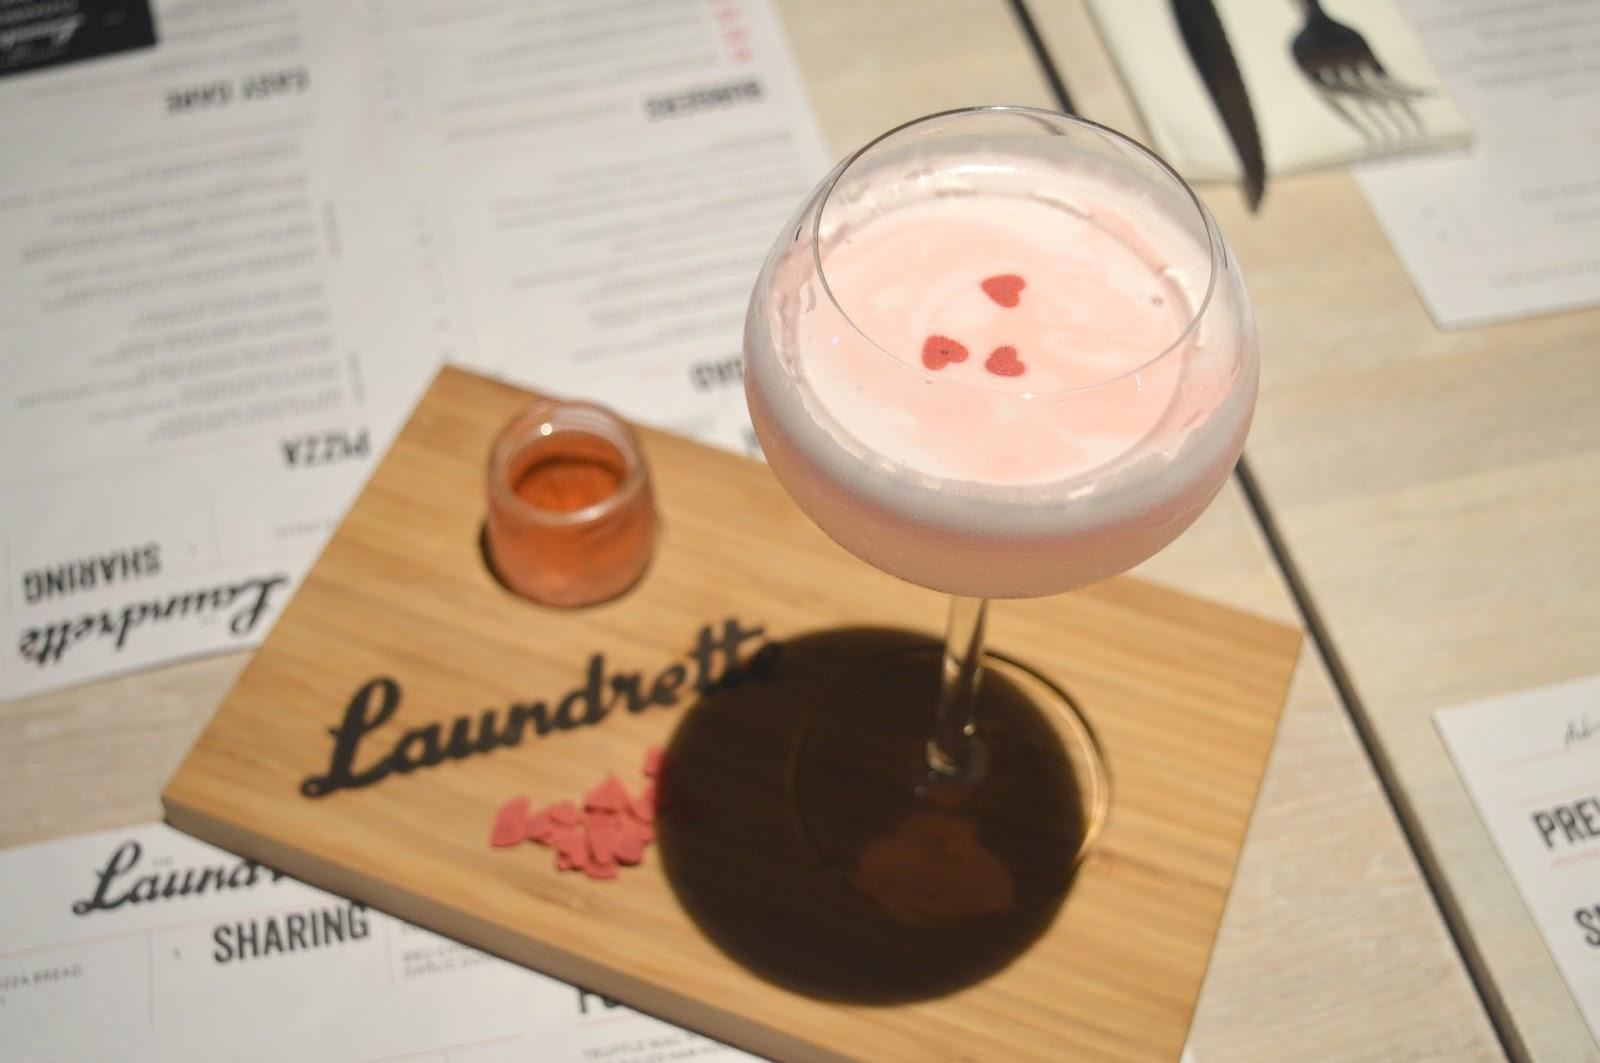 The Laundrette, Newcastle - The Laundrette with Love